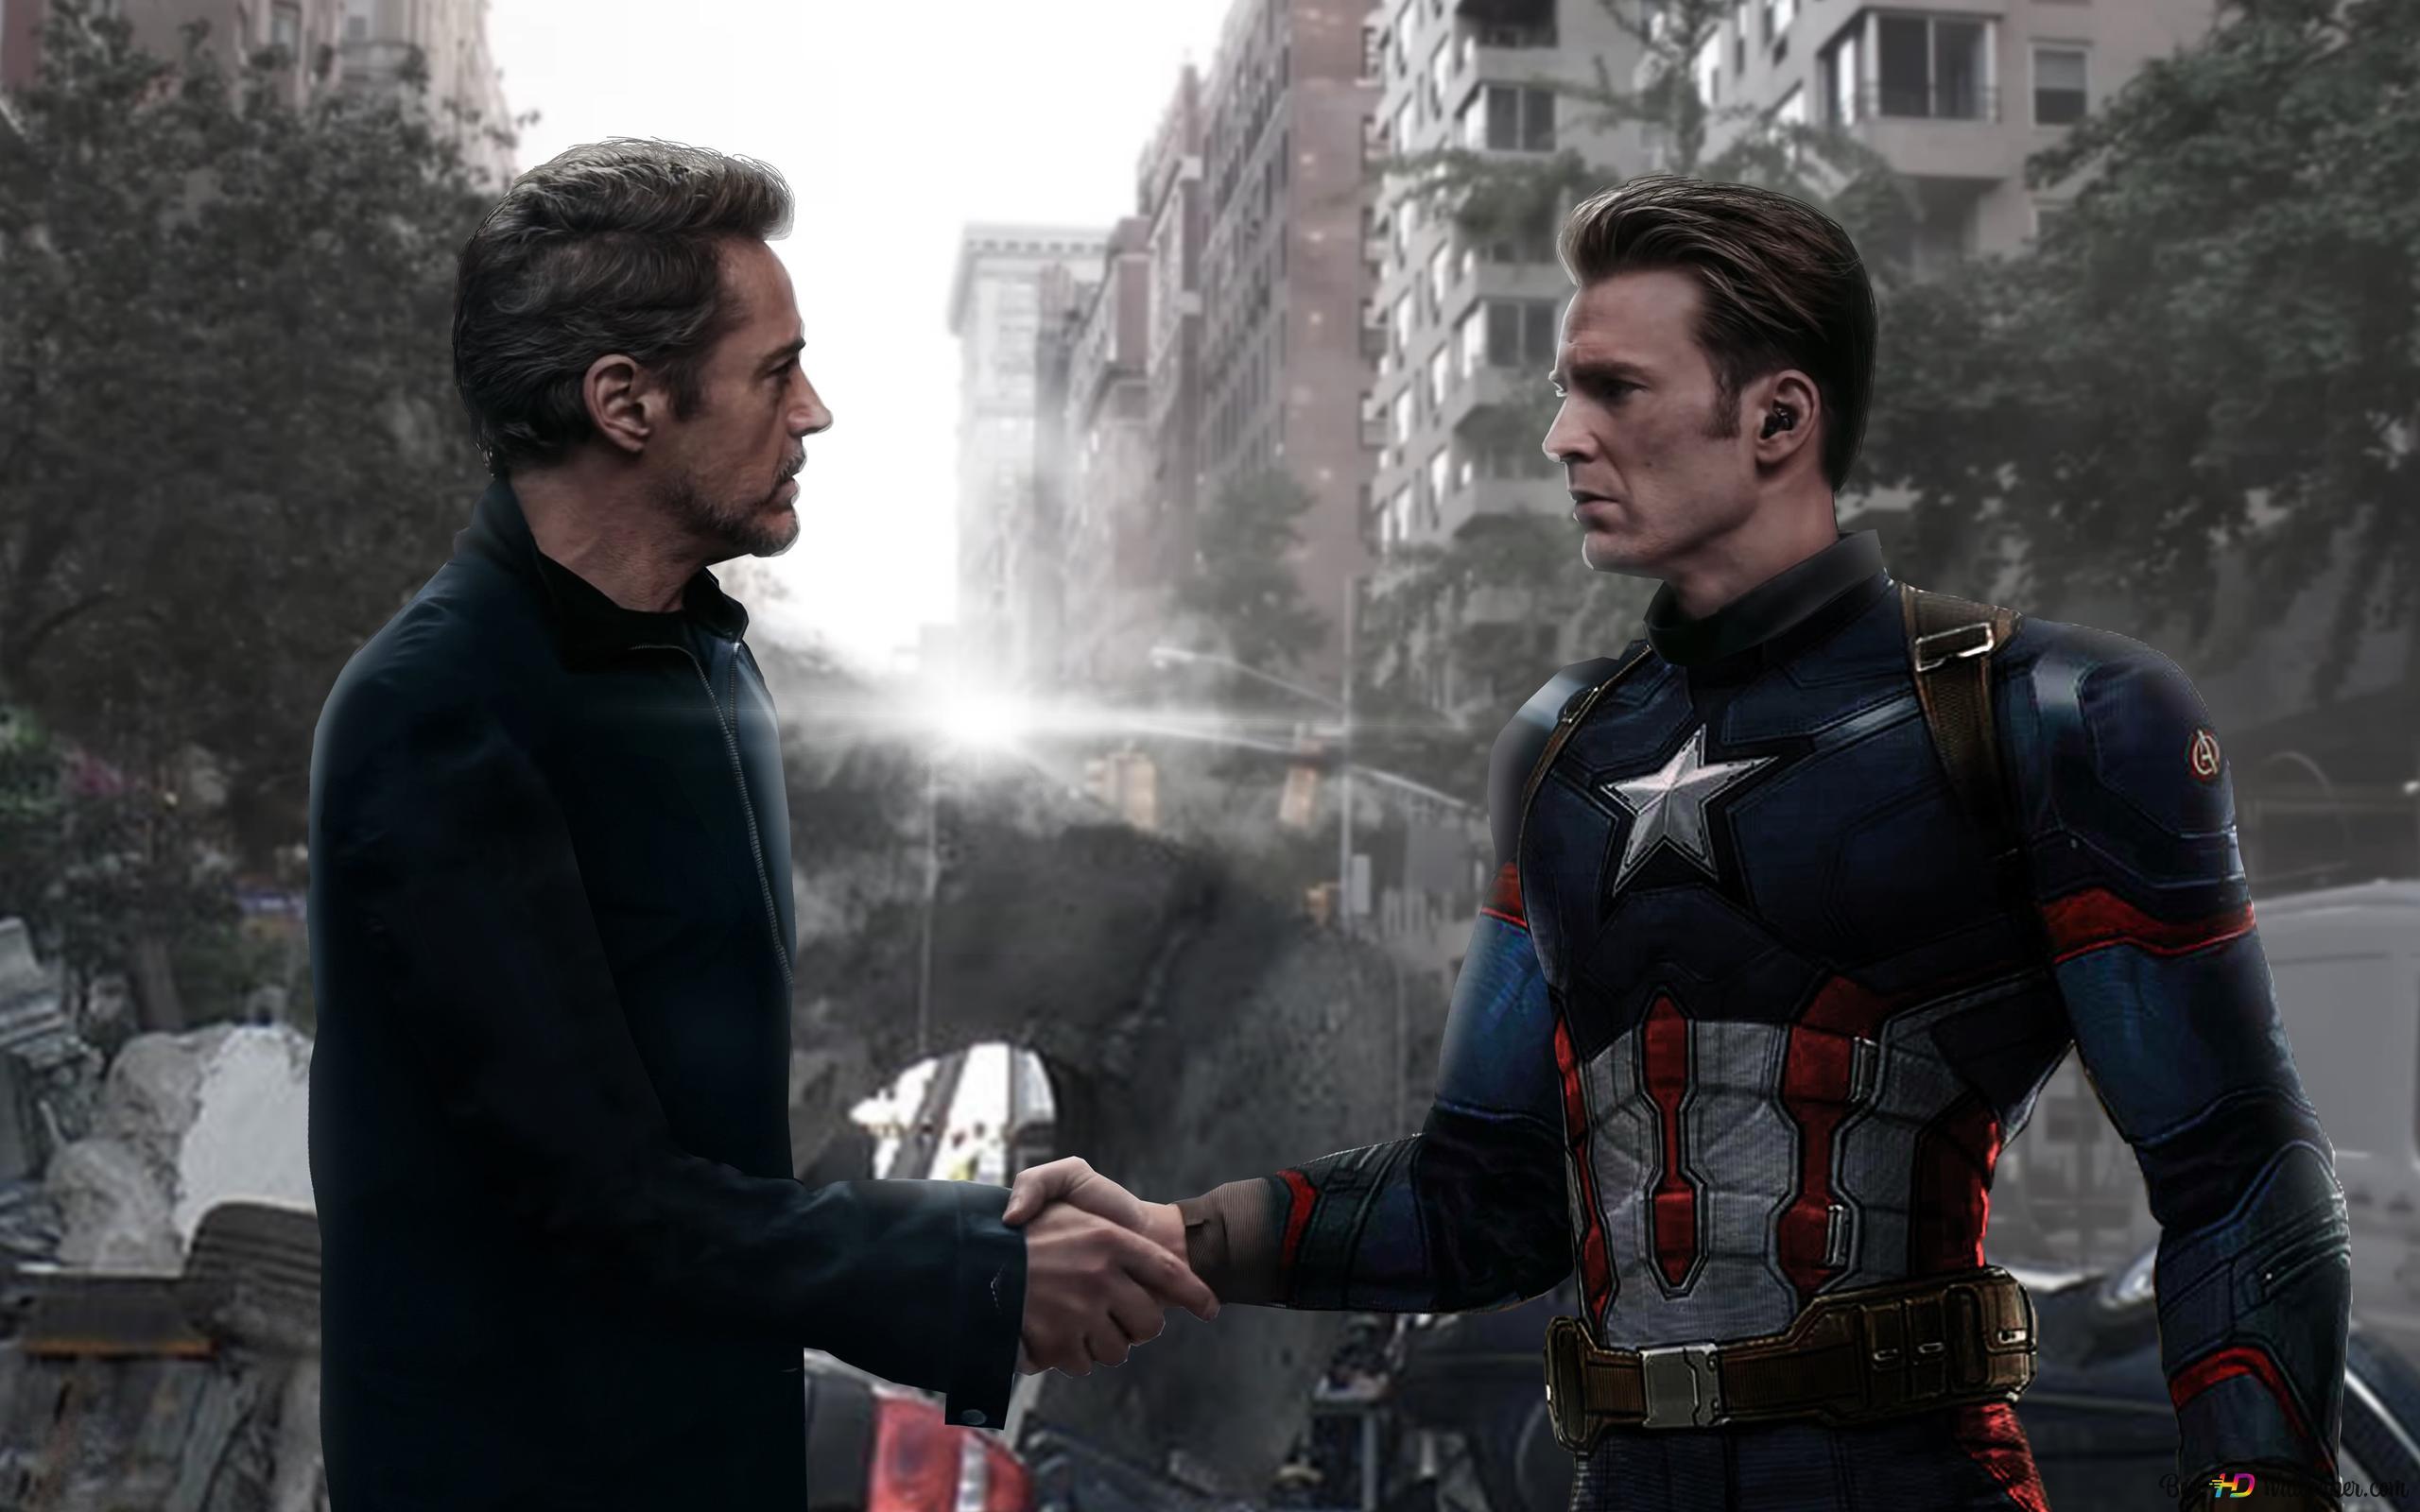 Capt America And Iron Man Endgame Hd Wallpaper Download